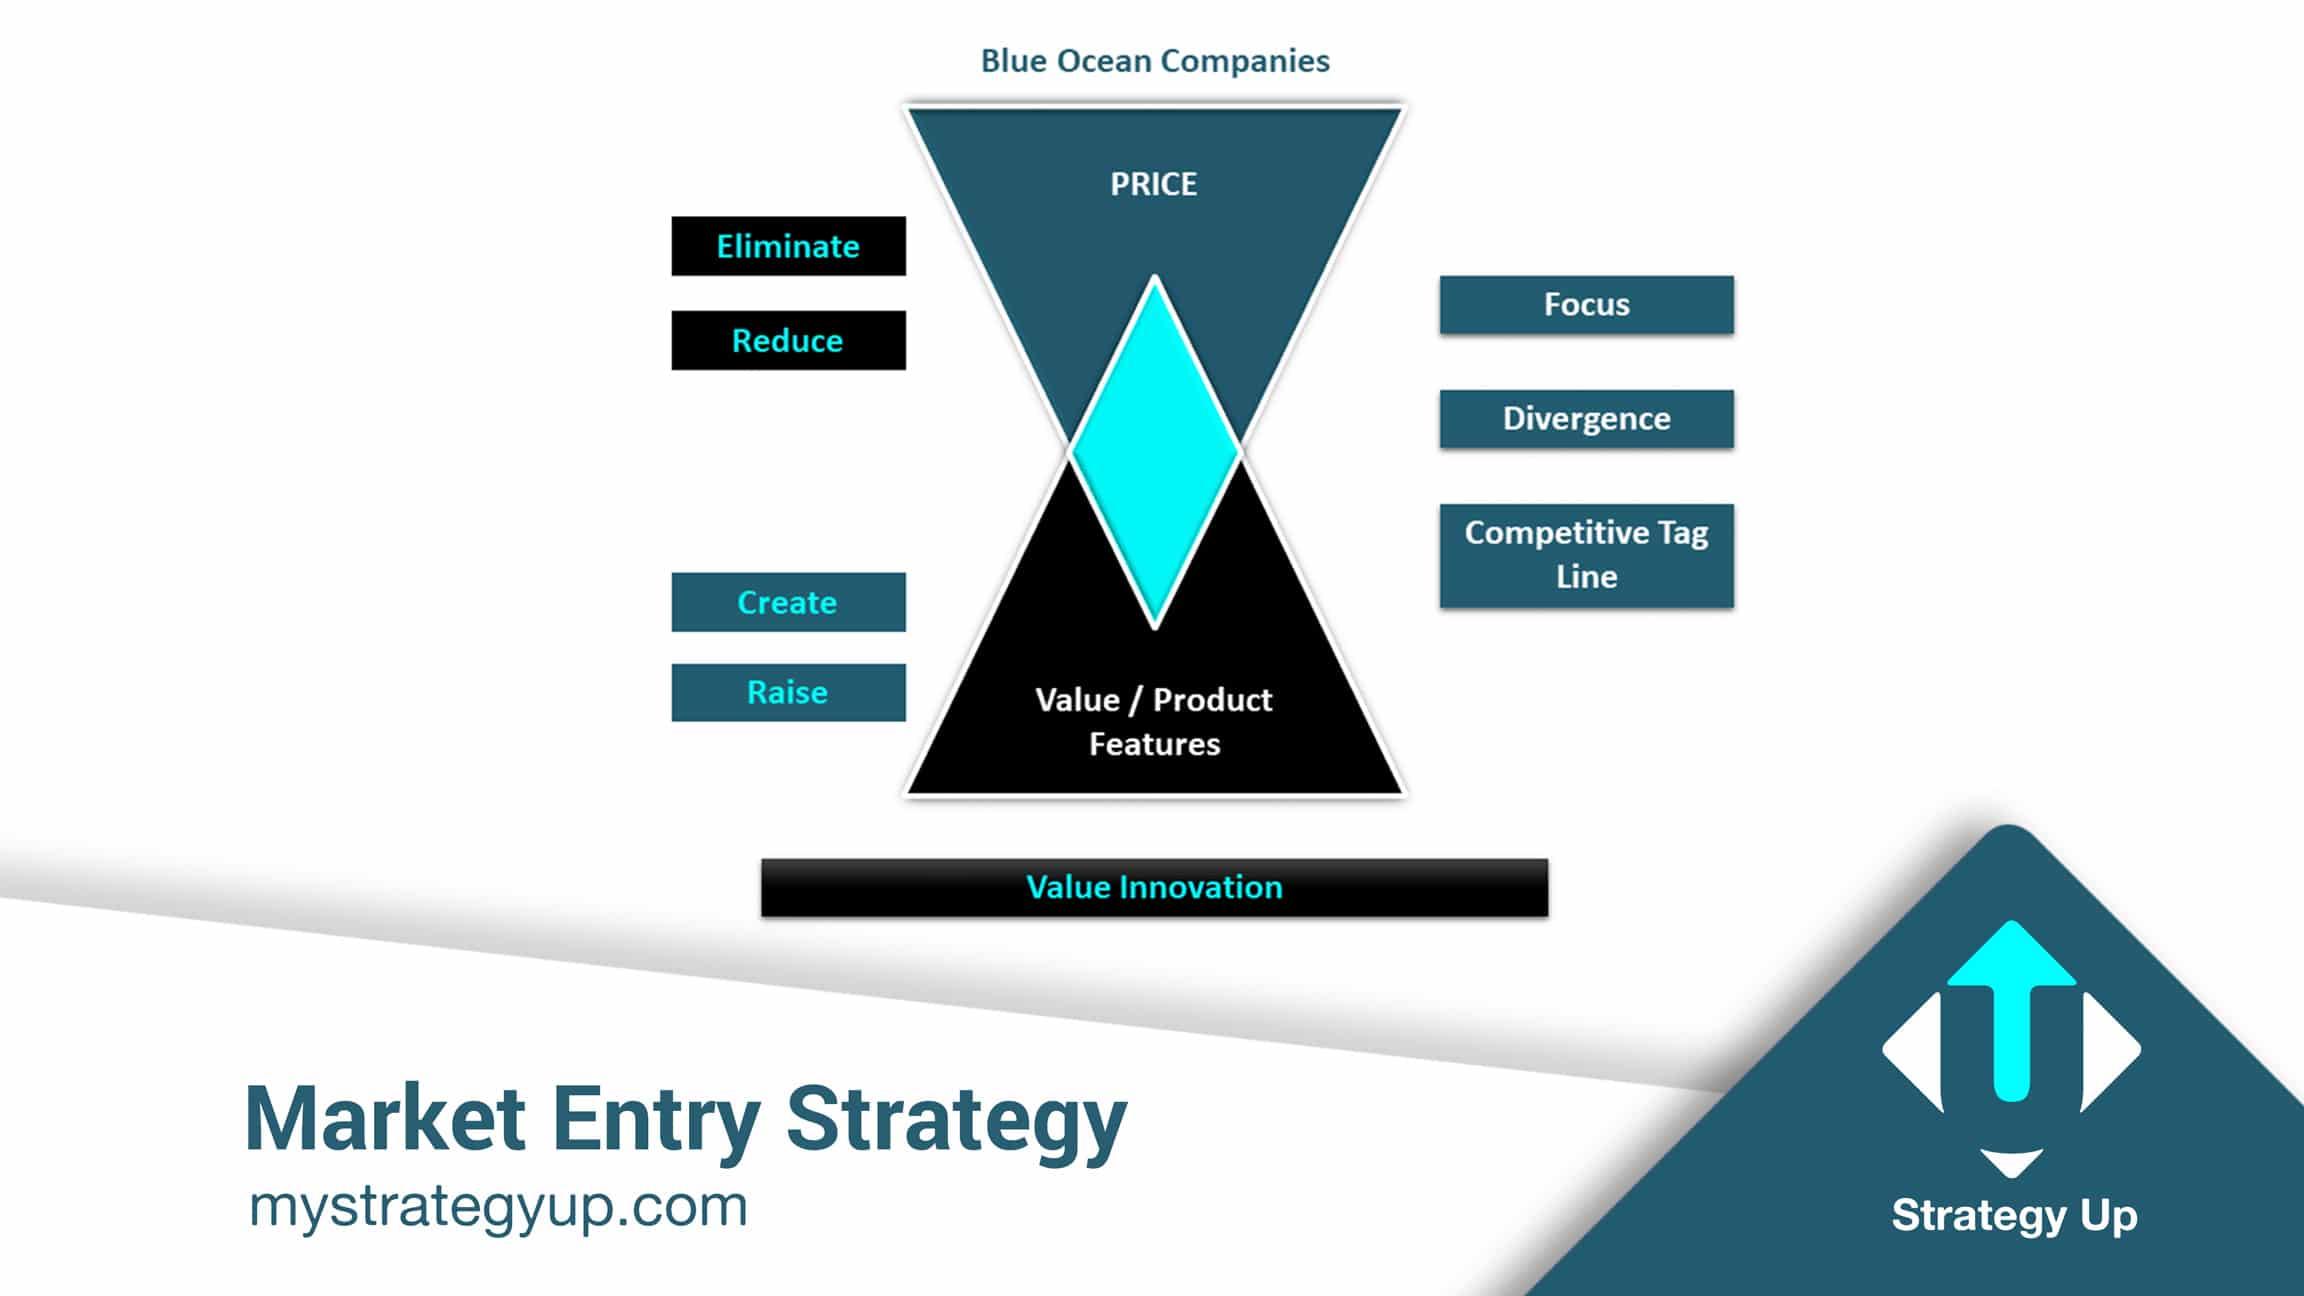 market entry strategy - Blue Ocean